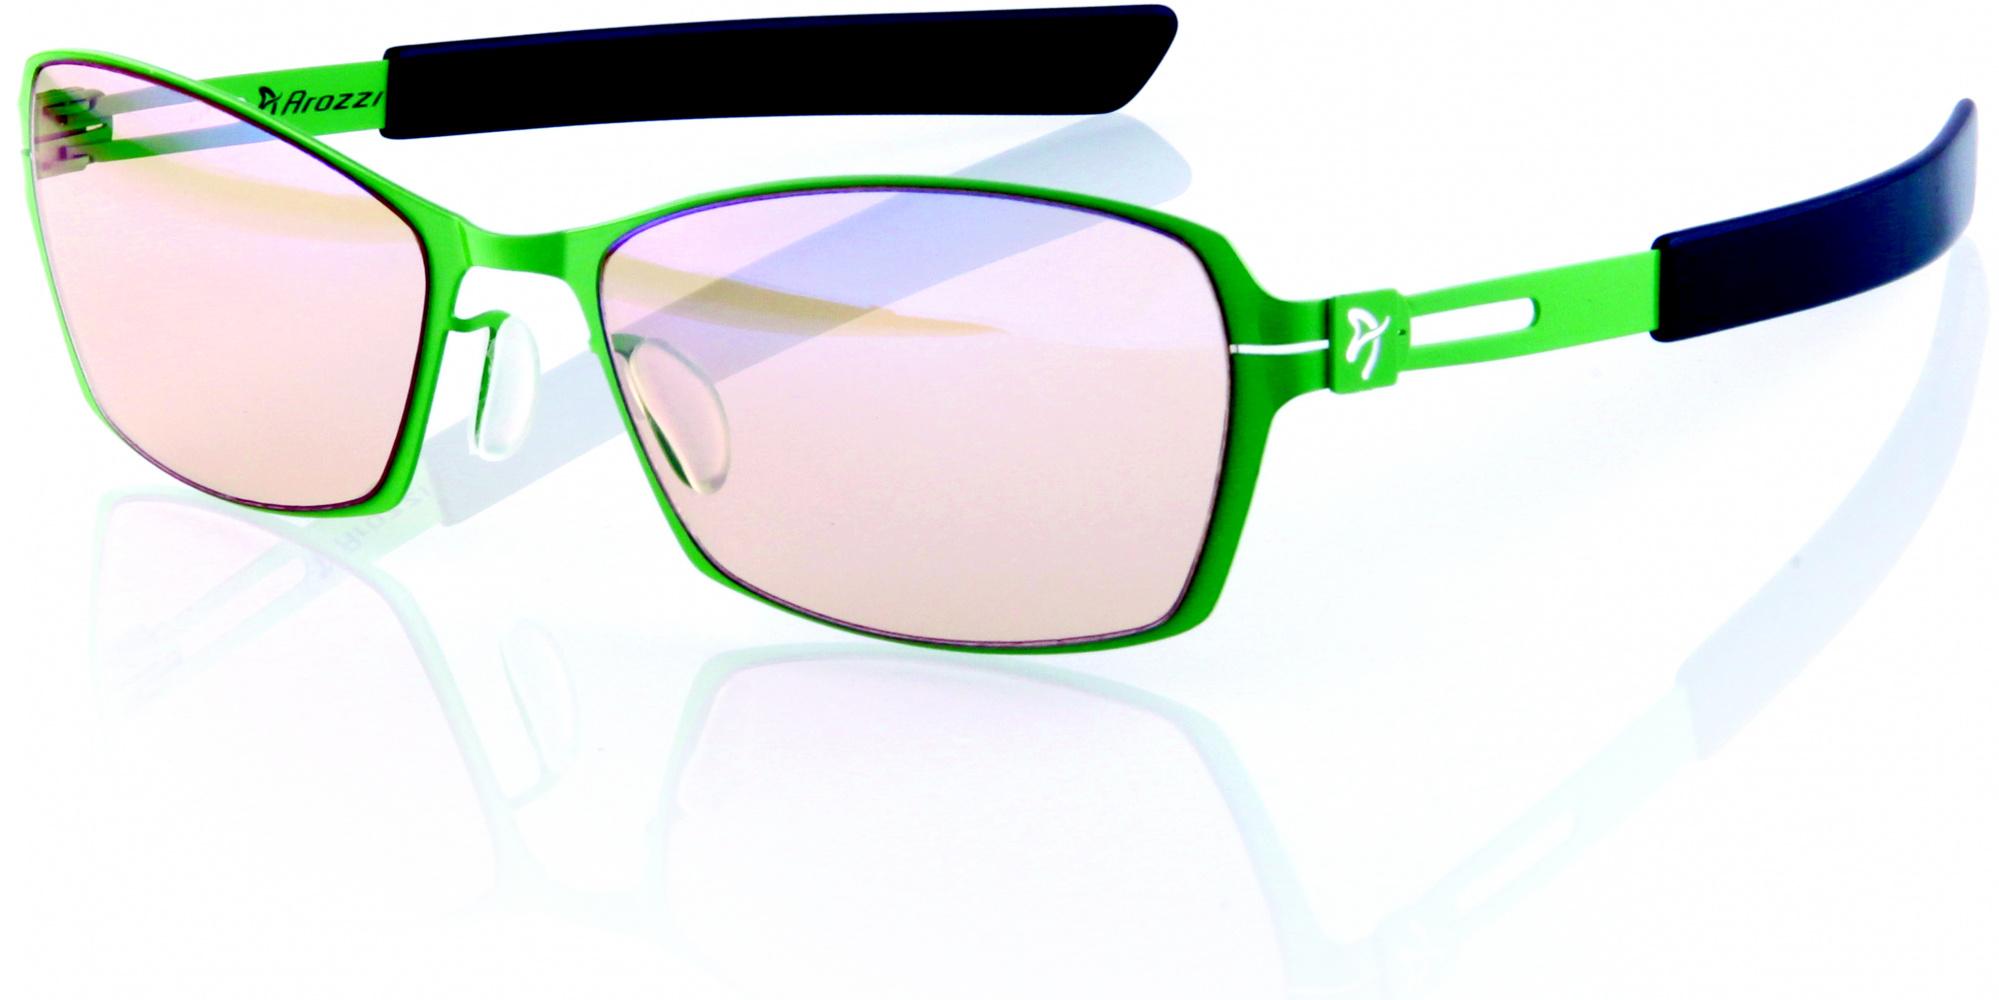 arozzi Очки для компьютера Arozzi Visione VX-500 (Green) VX500-3